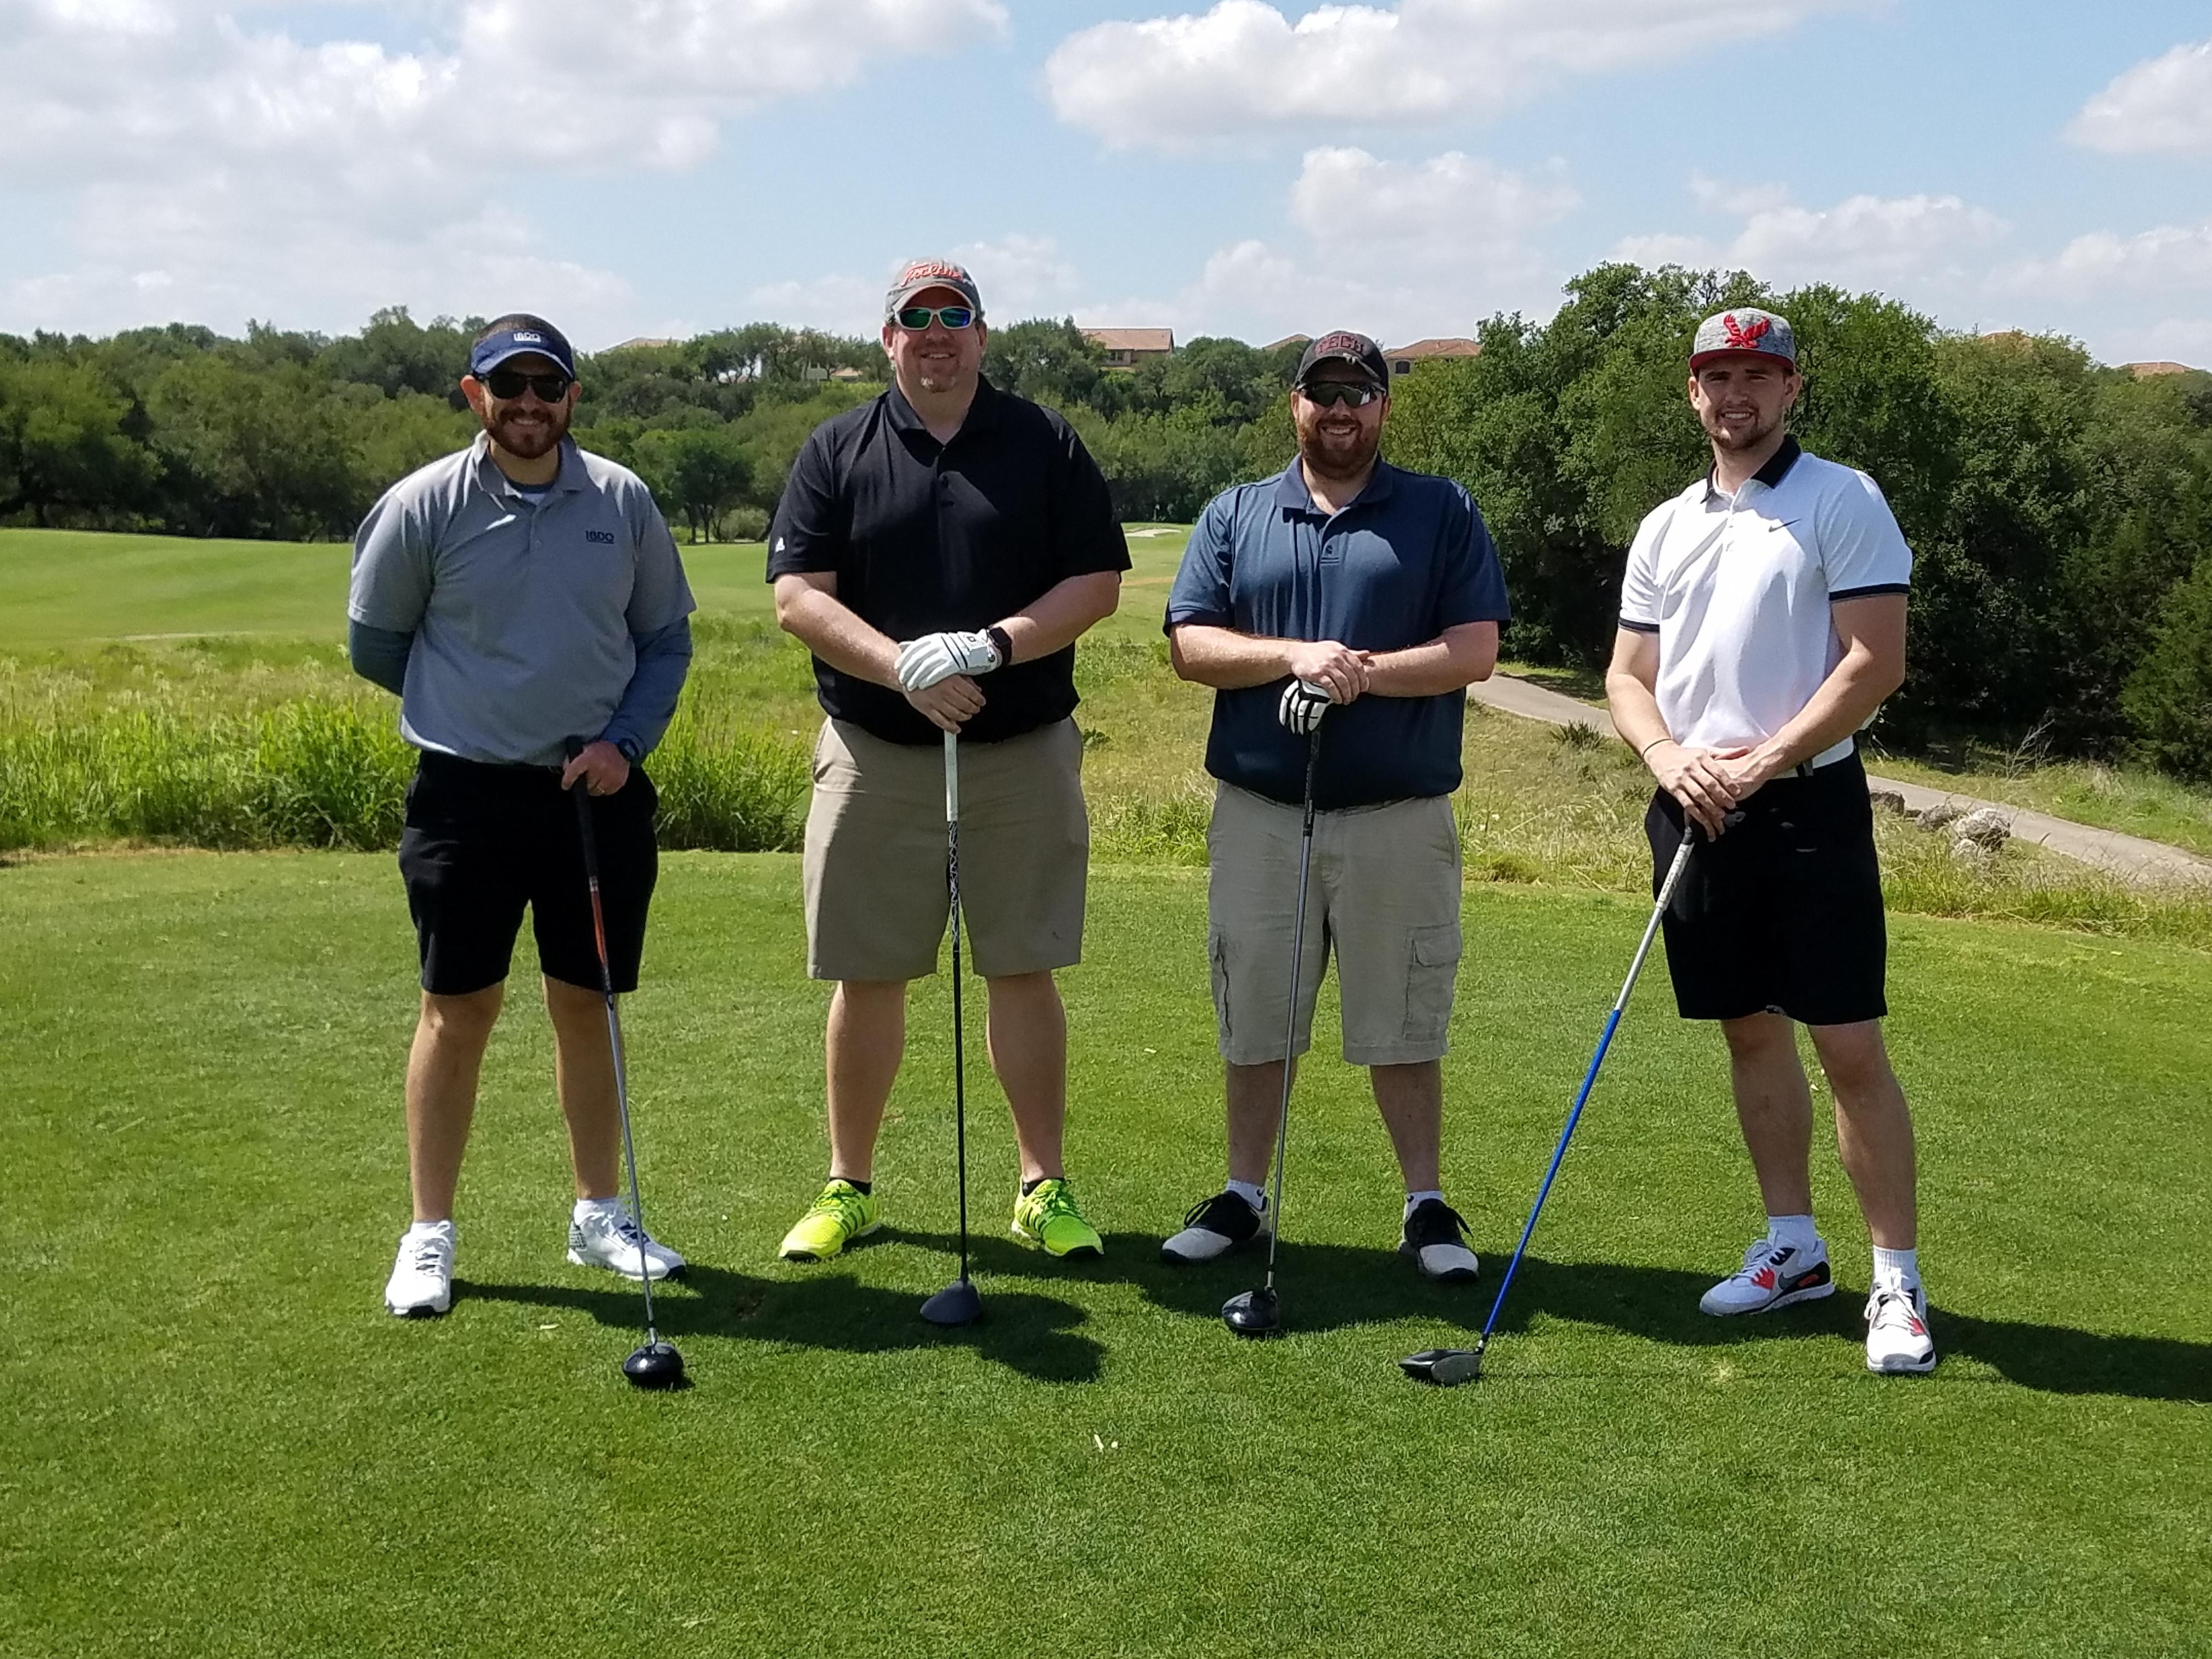 Kathleen Reymann Keil Memorial Golf Tournament Utsa